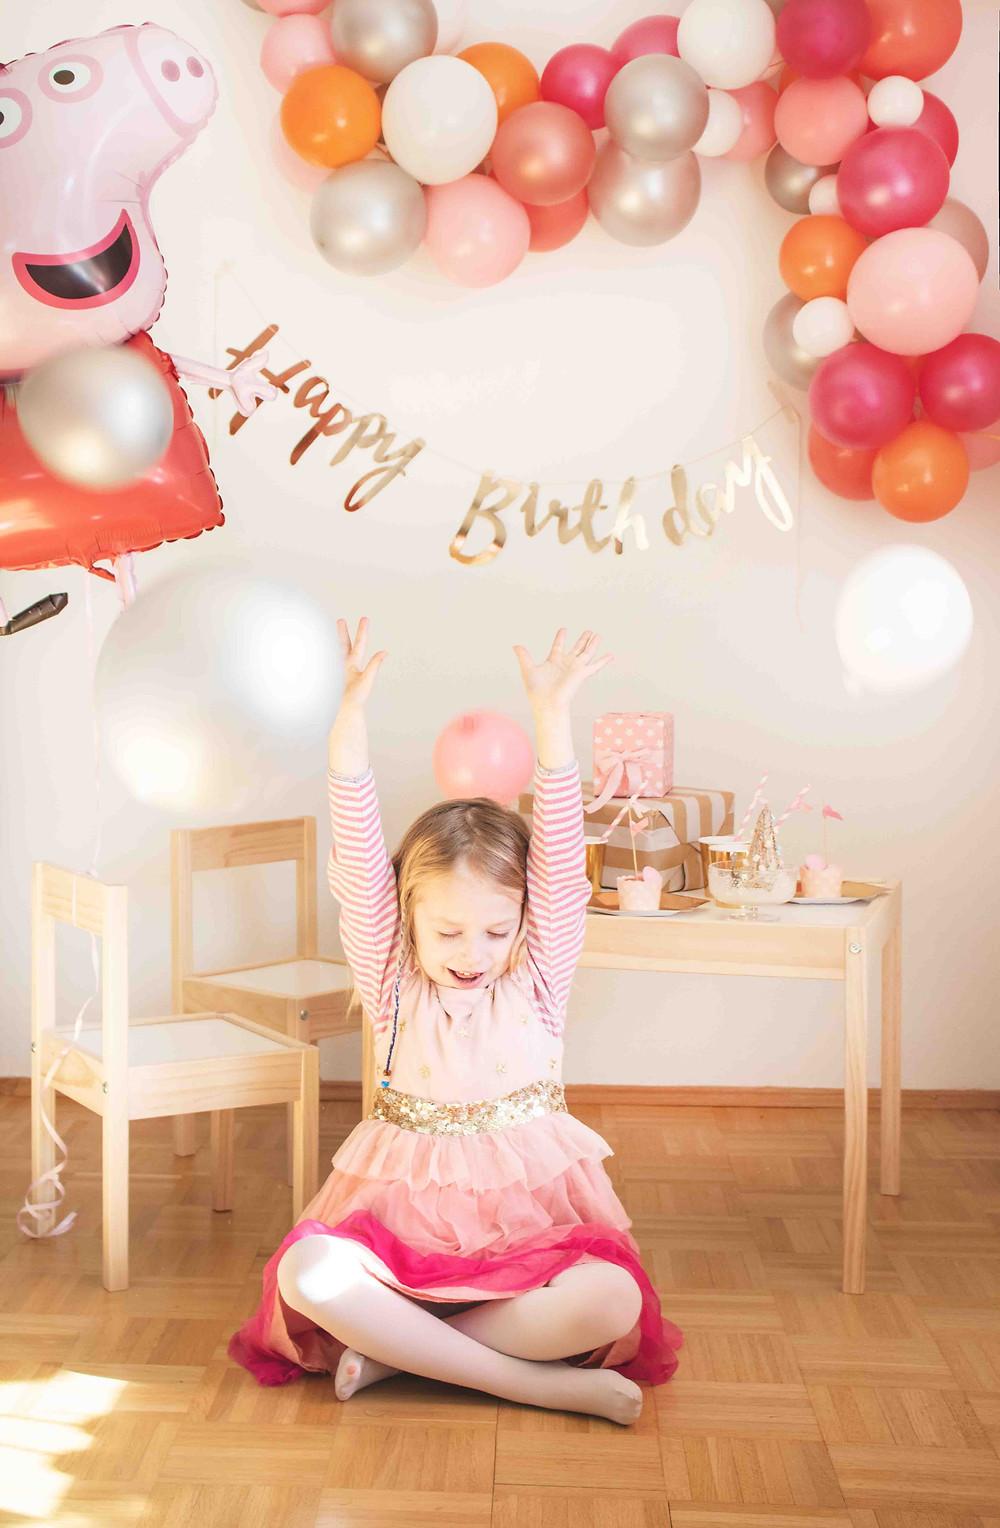 Peppa Wutz, Peppa Wutz Party, Mottoparty, Kindergeburtstag, Mädchengeburtstag, Kinderdeko, Partydeko, Geburtstagsdeko